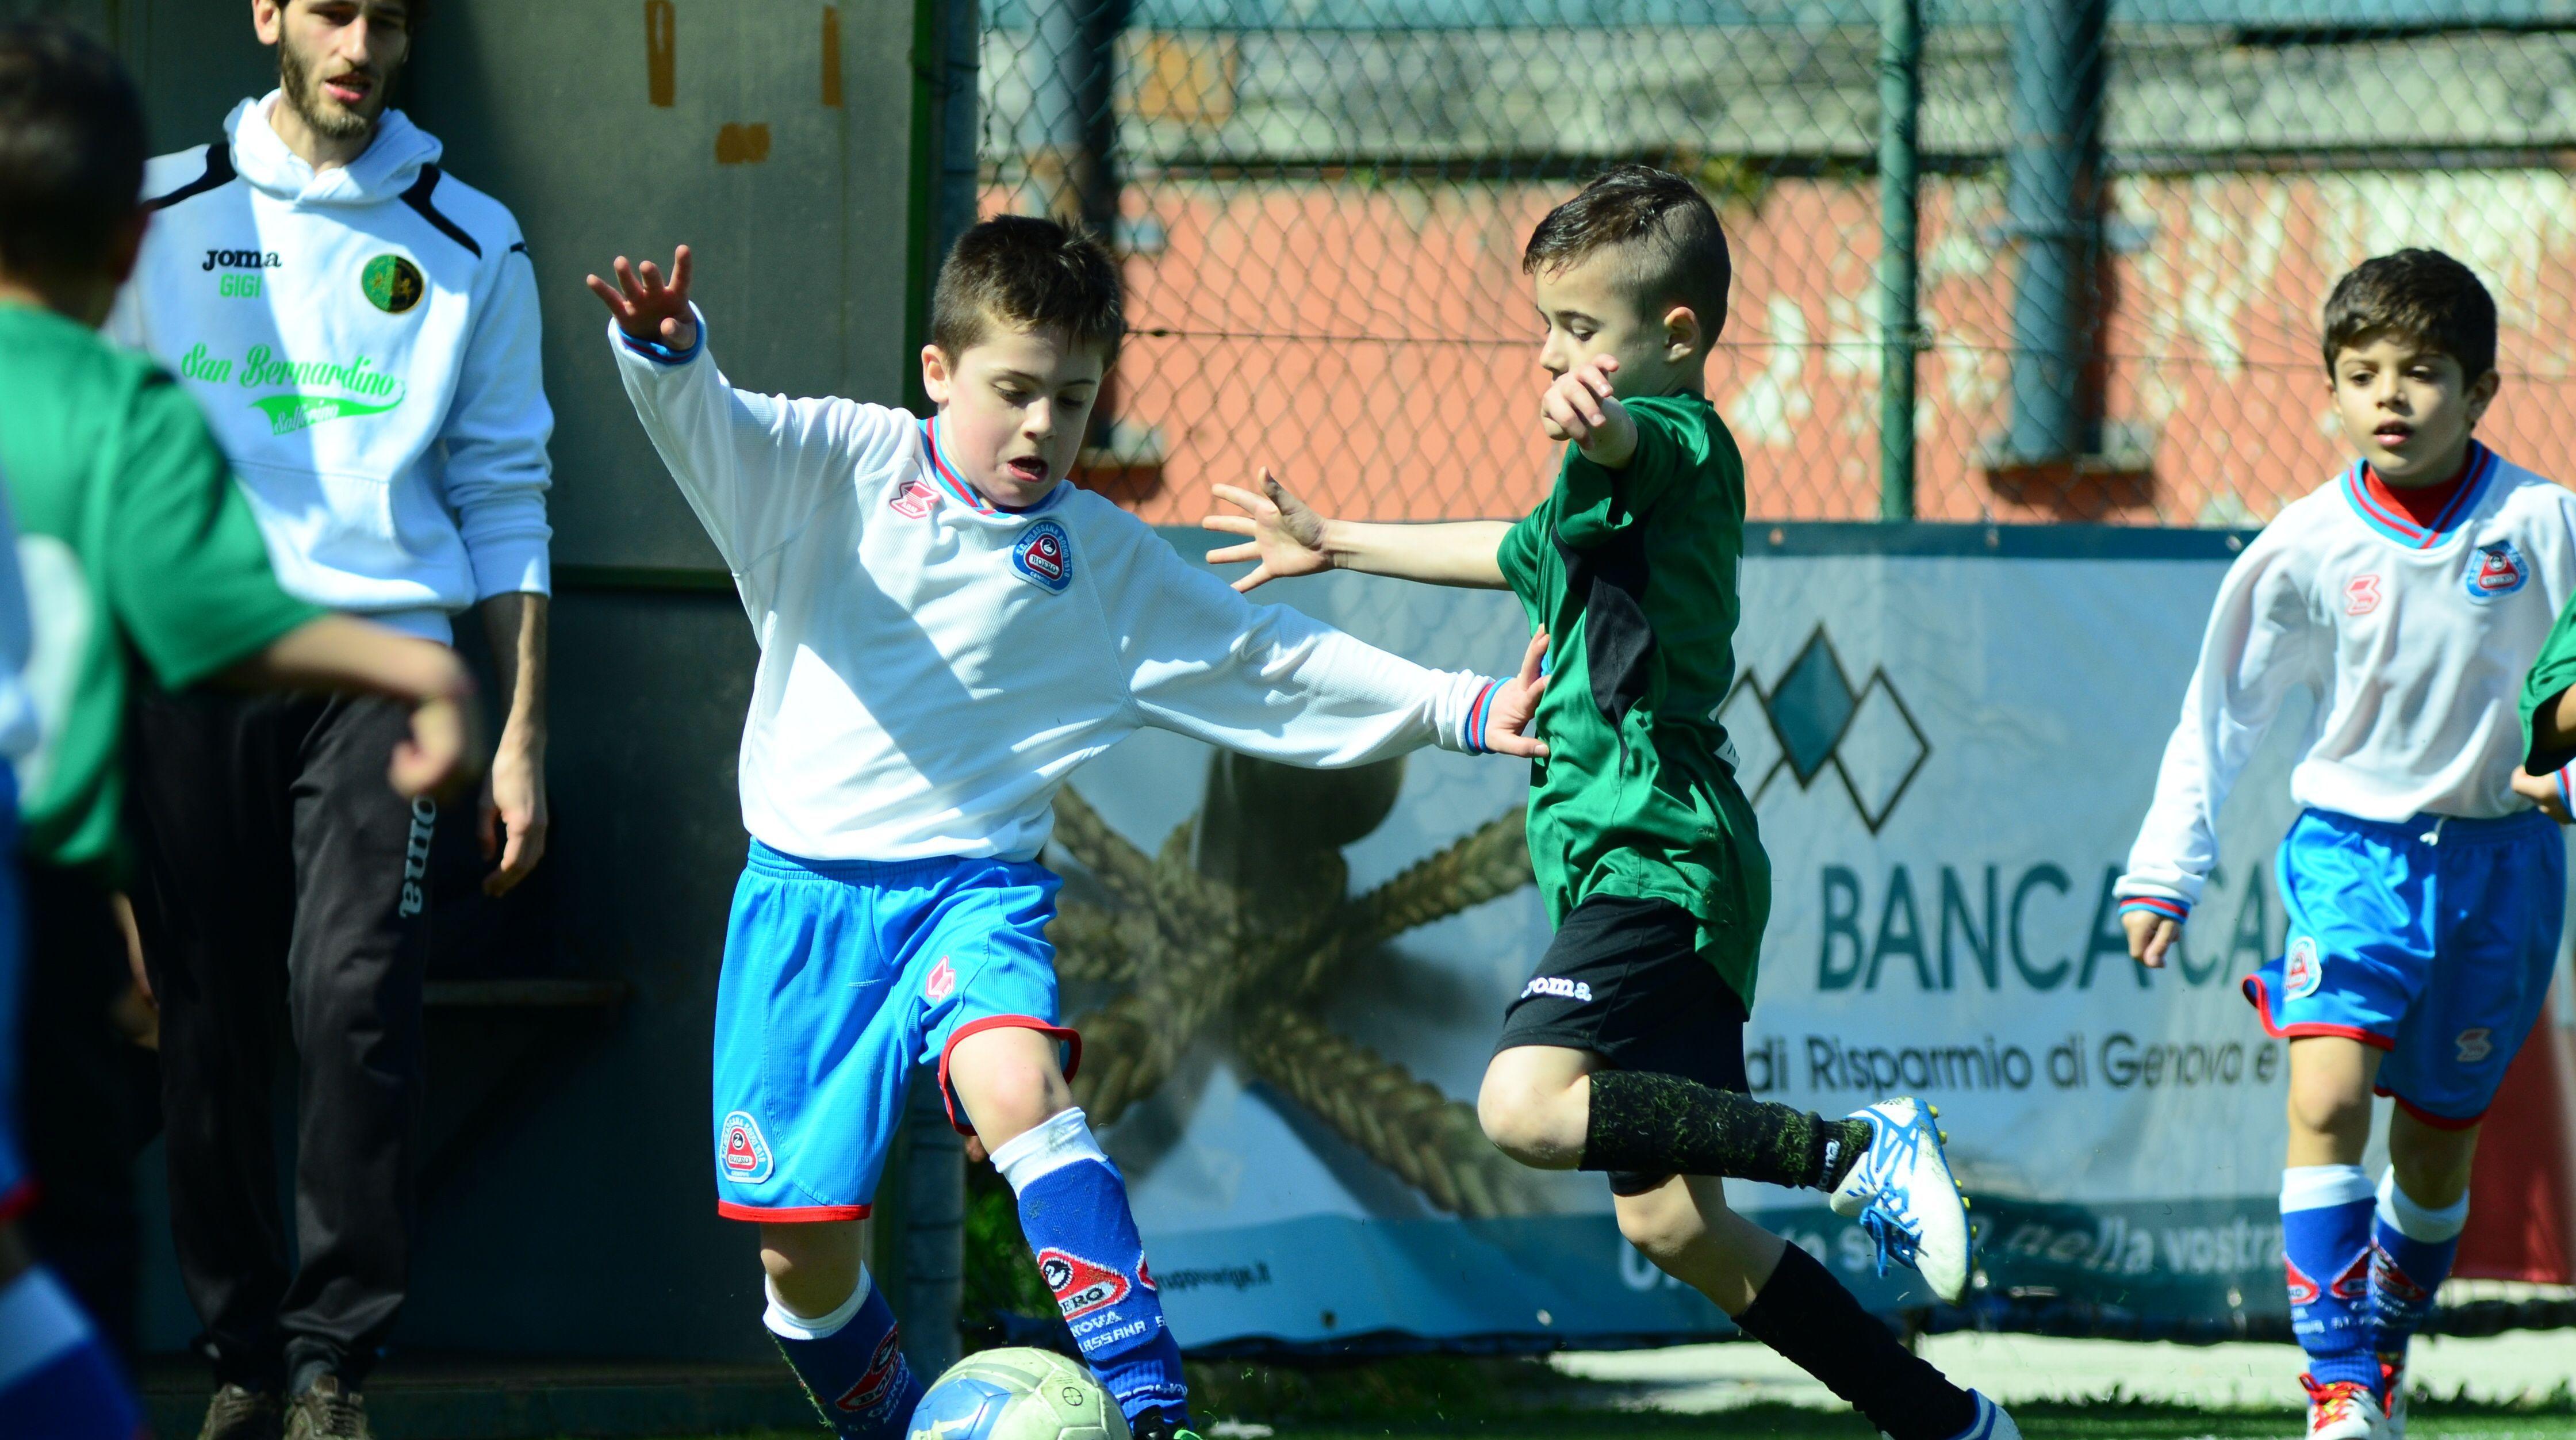 Trofeo Caravella